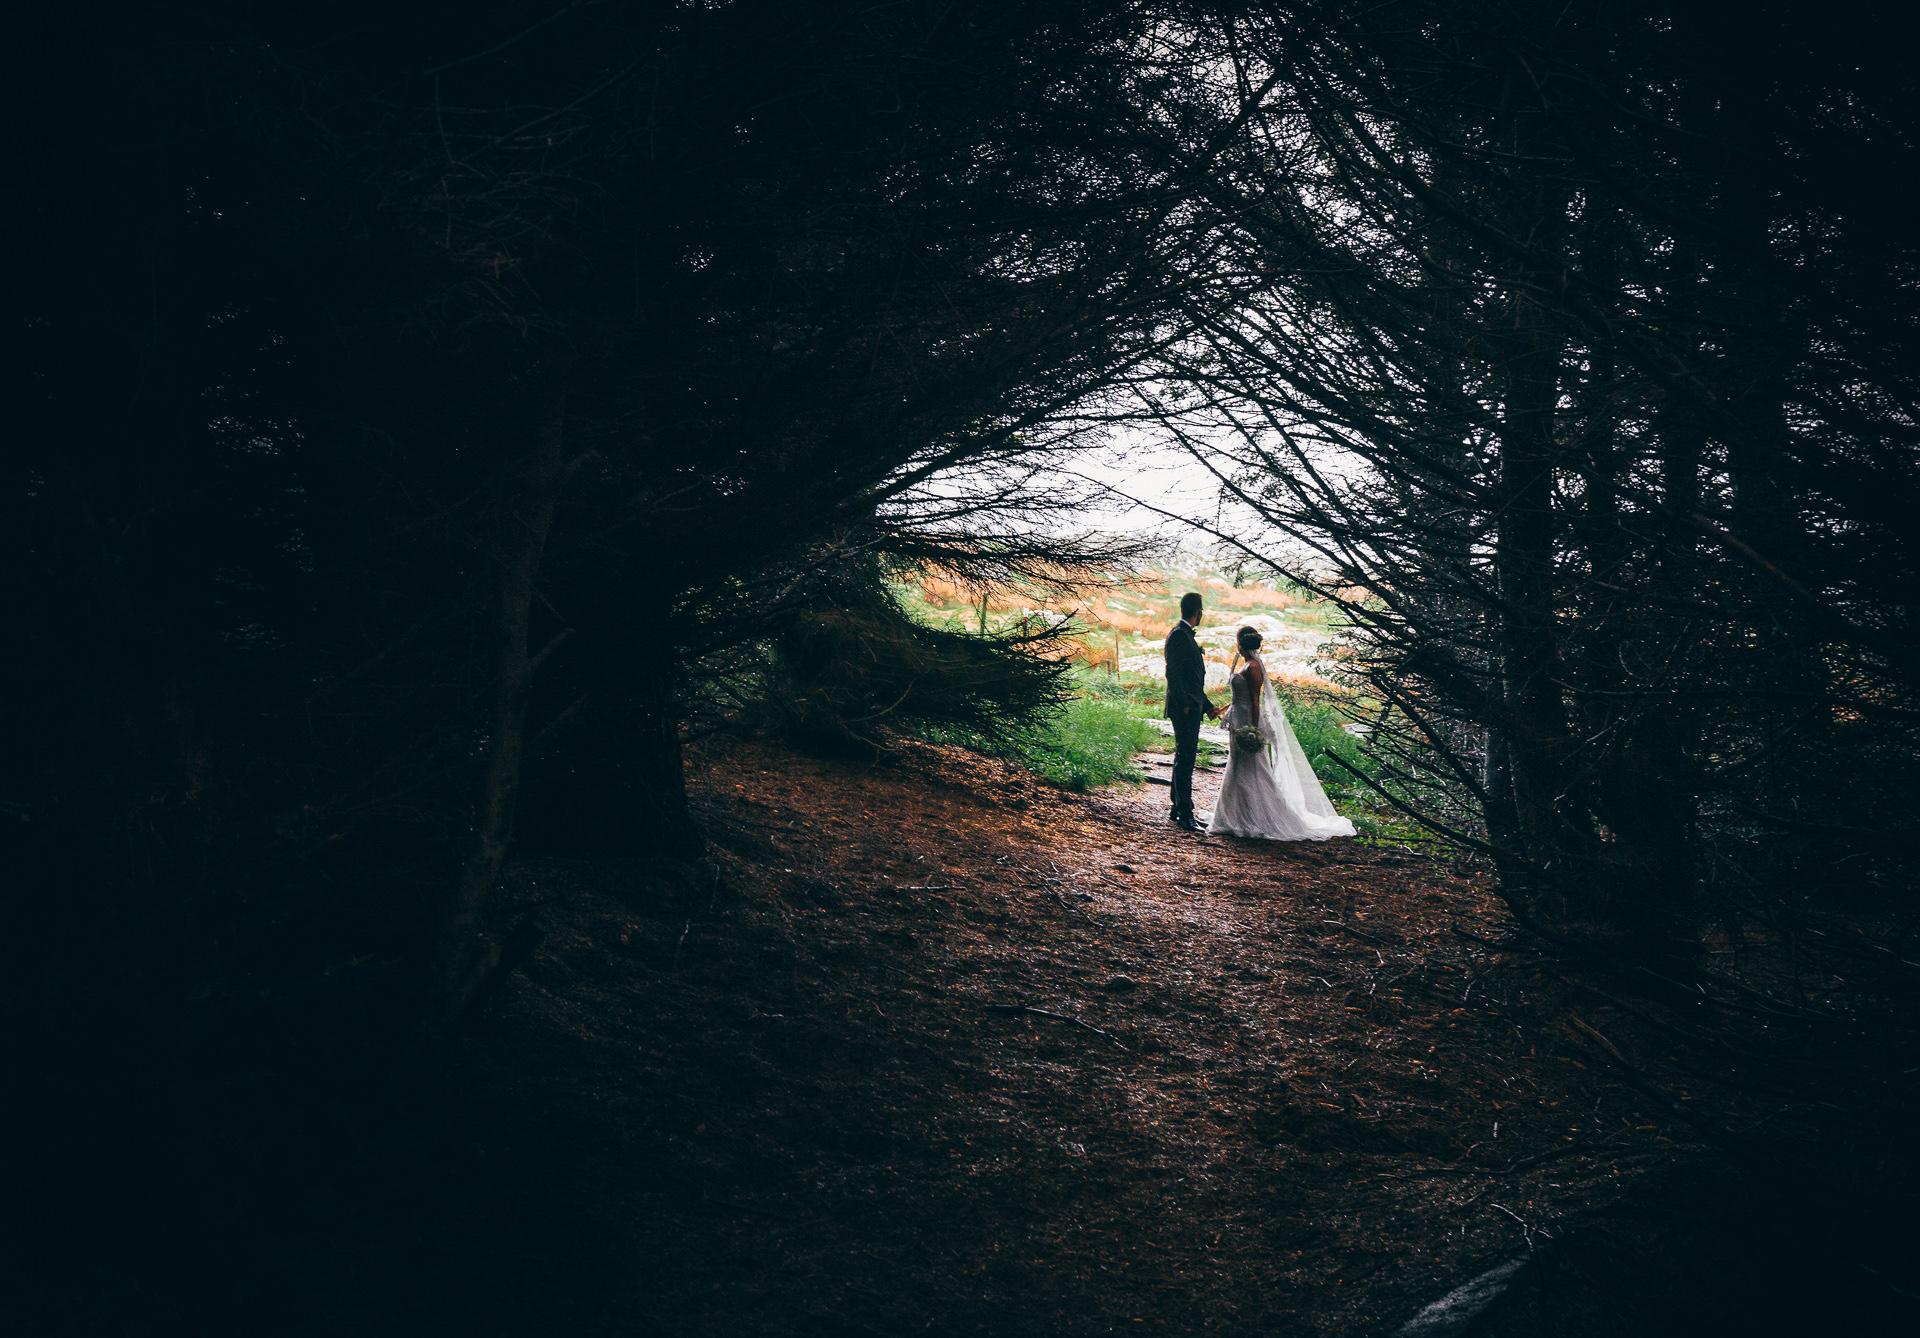 Wedding+Photographer+Norway+Bryllupsfotograf+Casey+Arneson-262.jpg